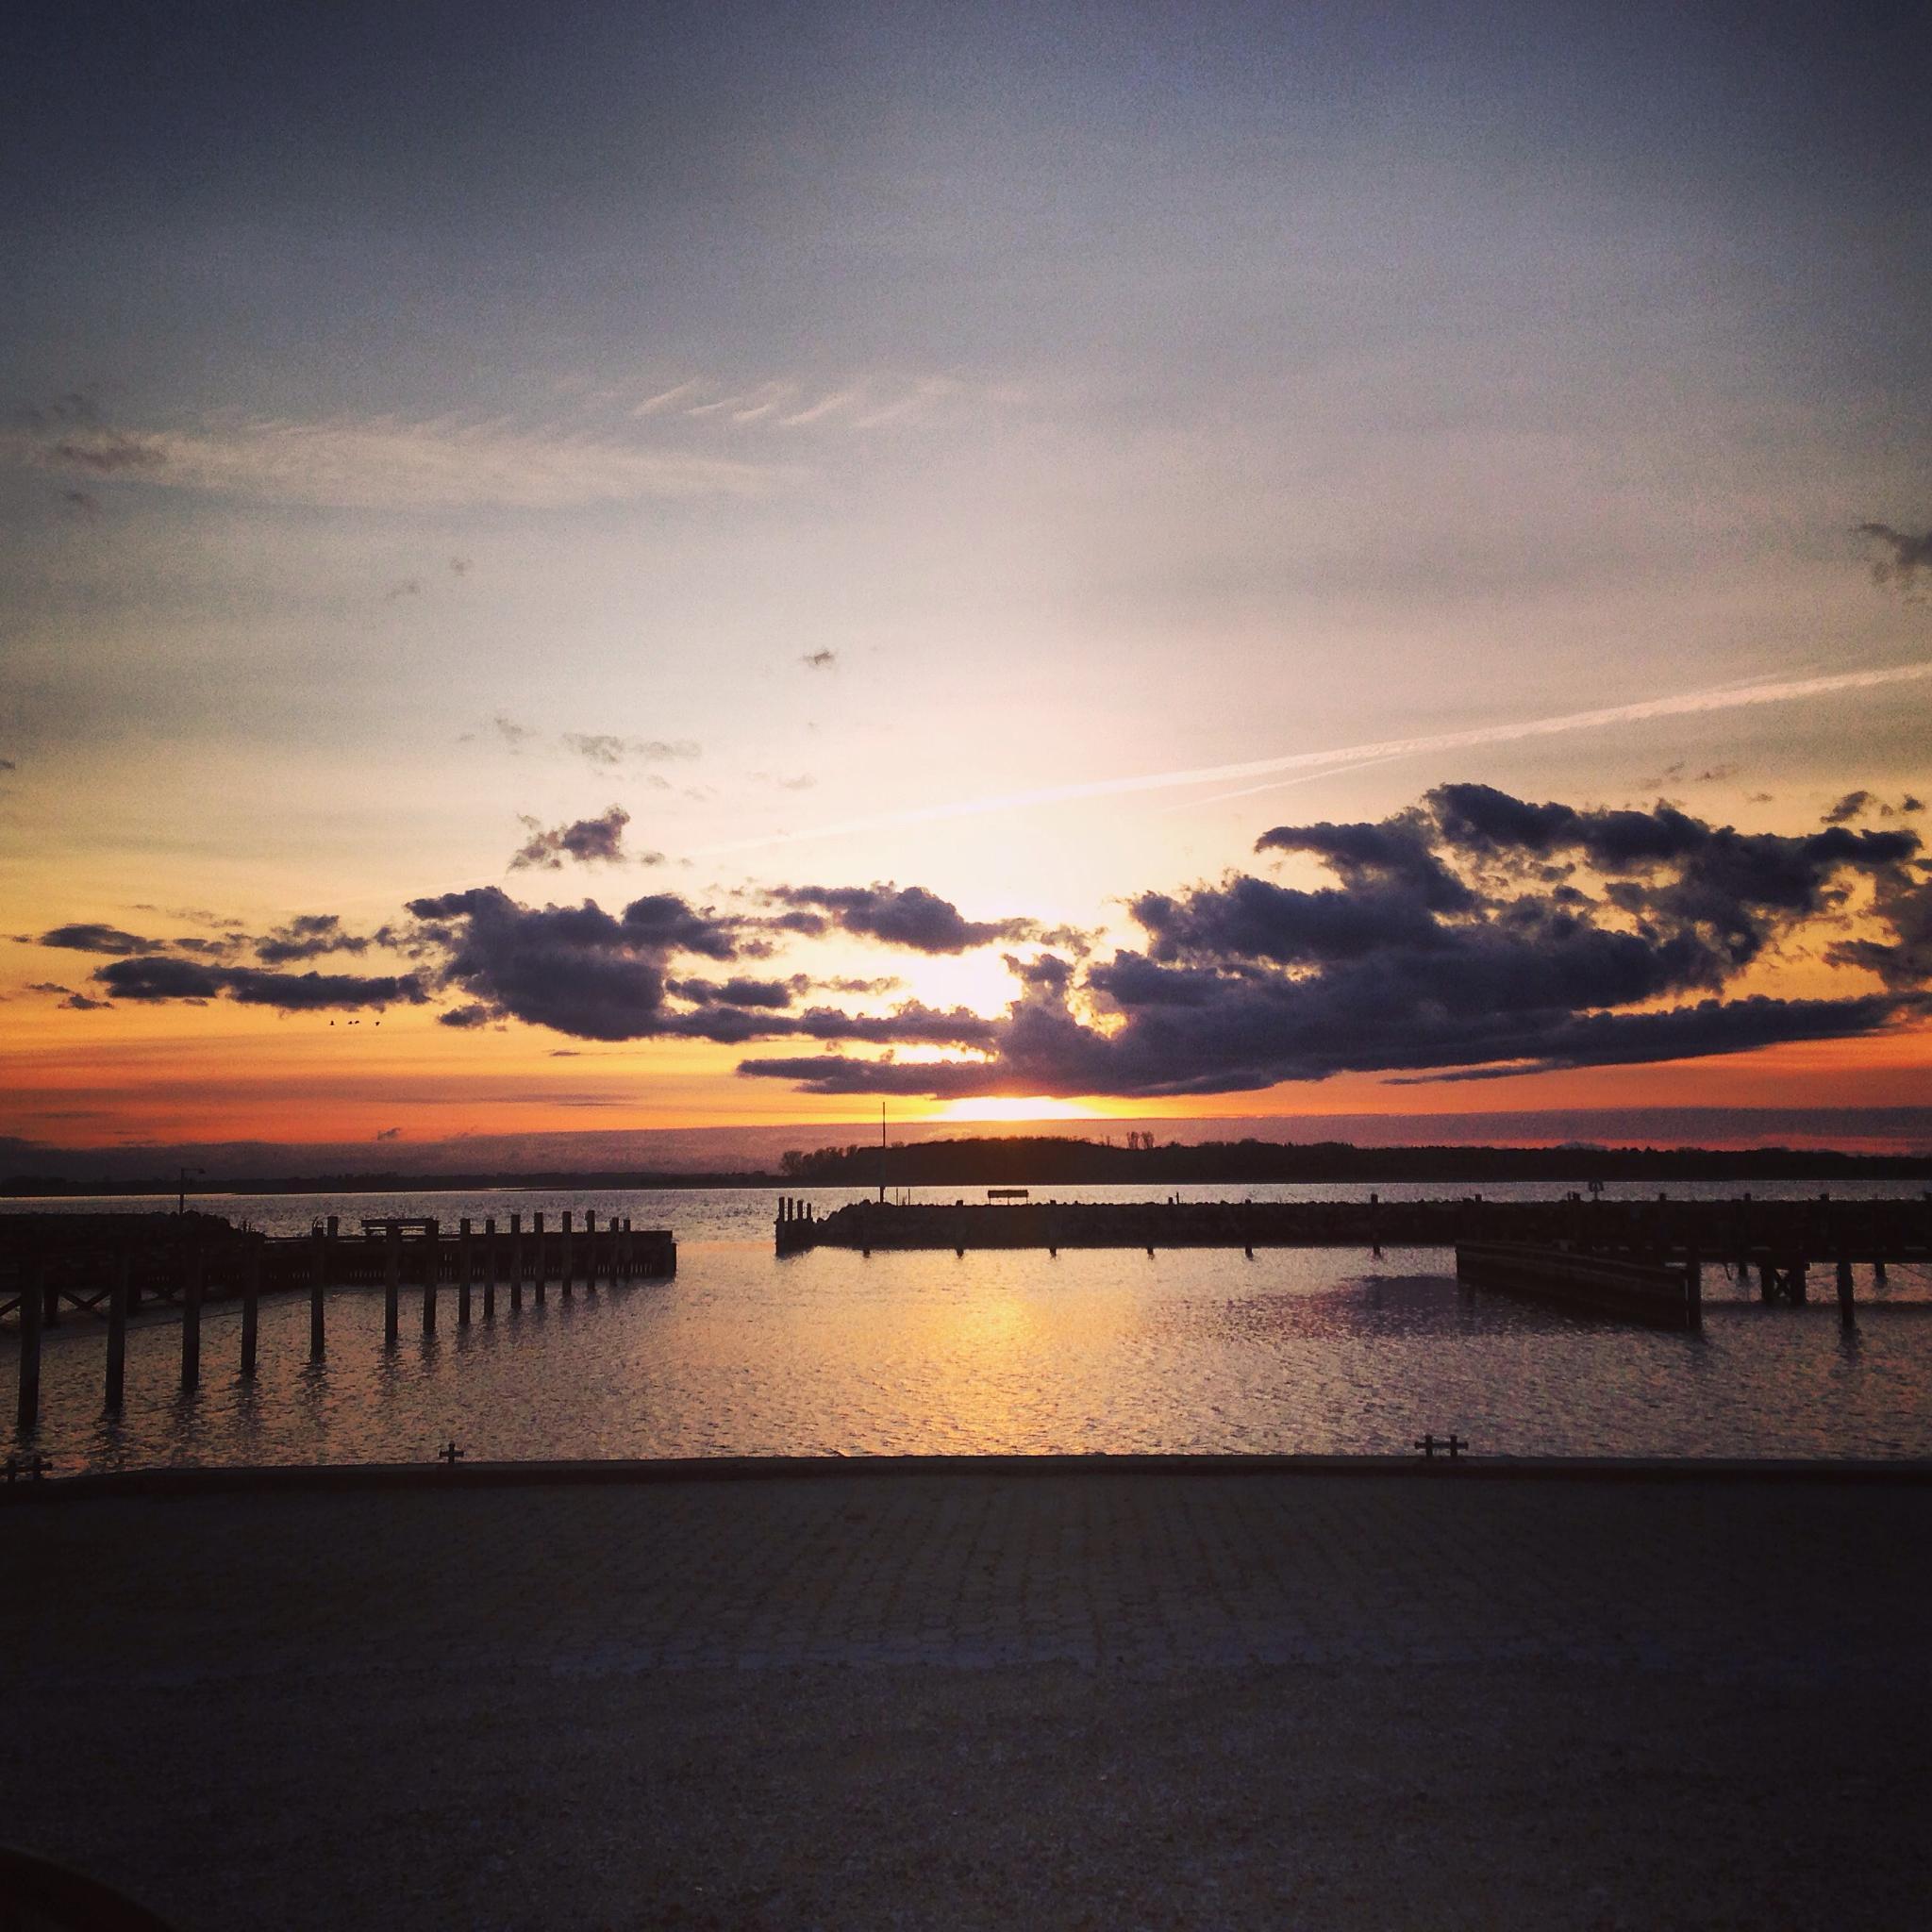 Sunset by nicoleta